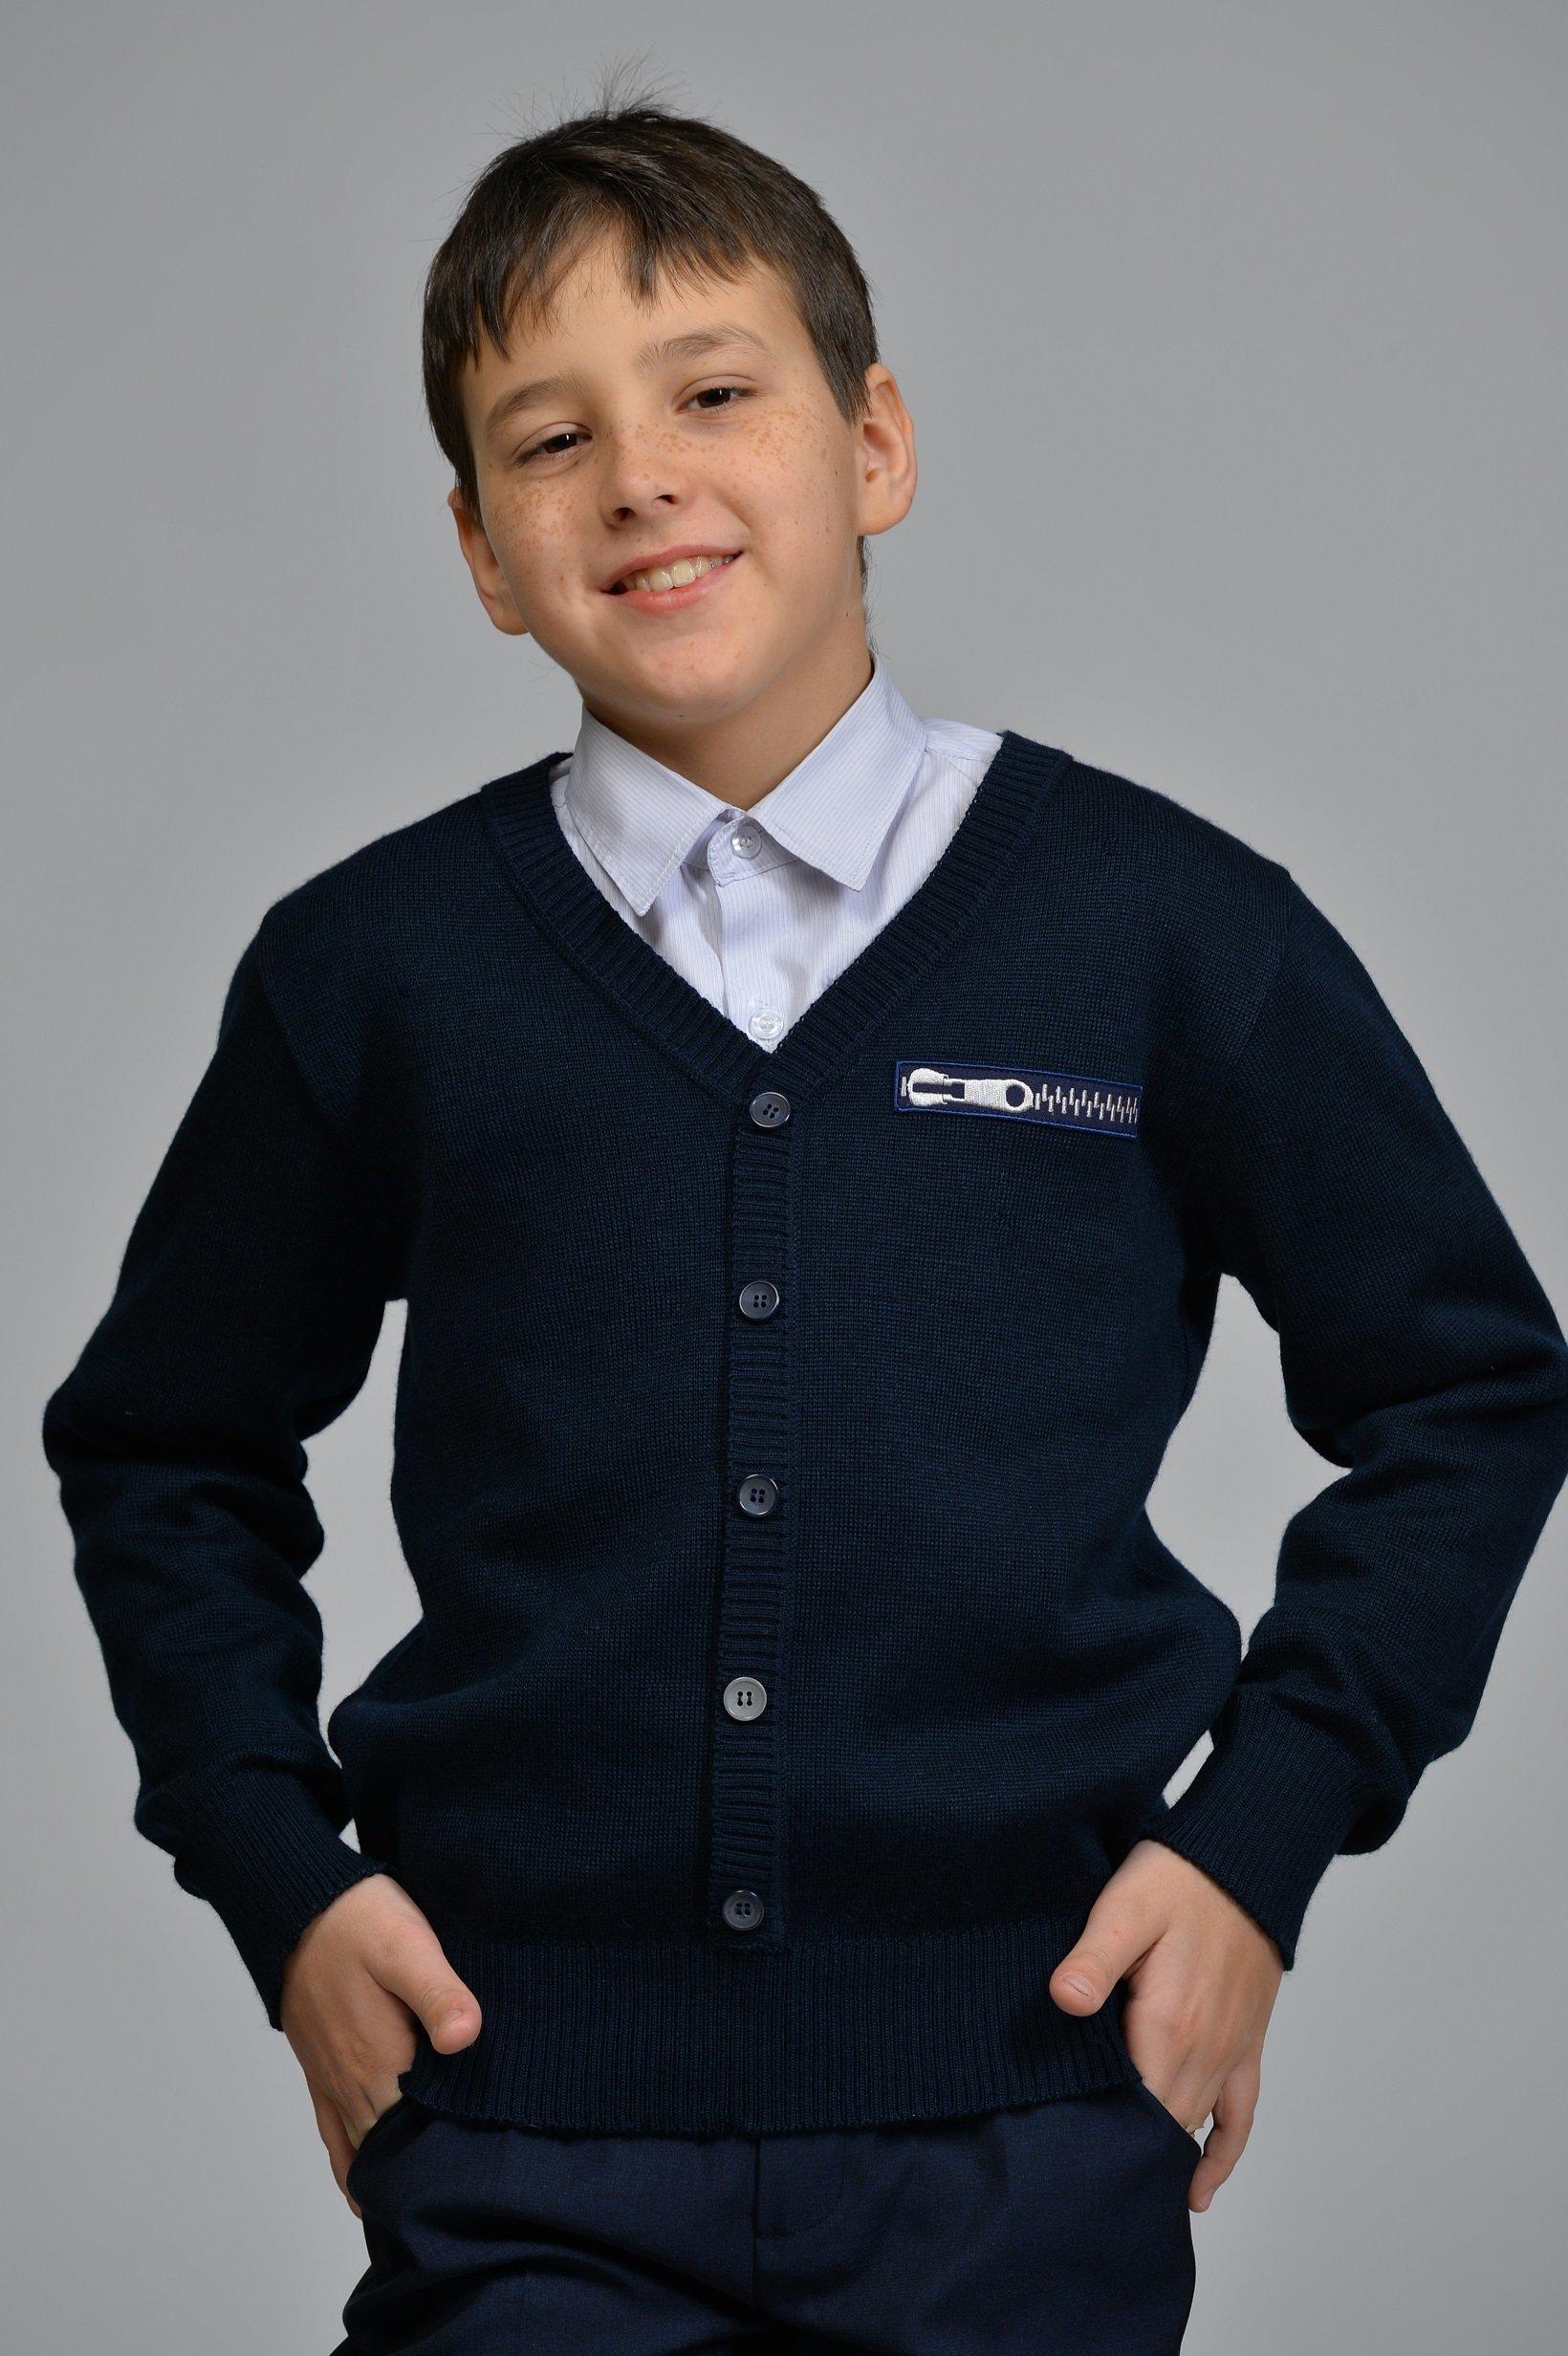 Пуловер для мальчика DSDT213син